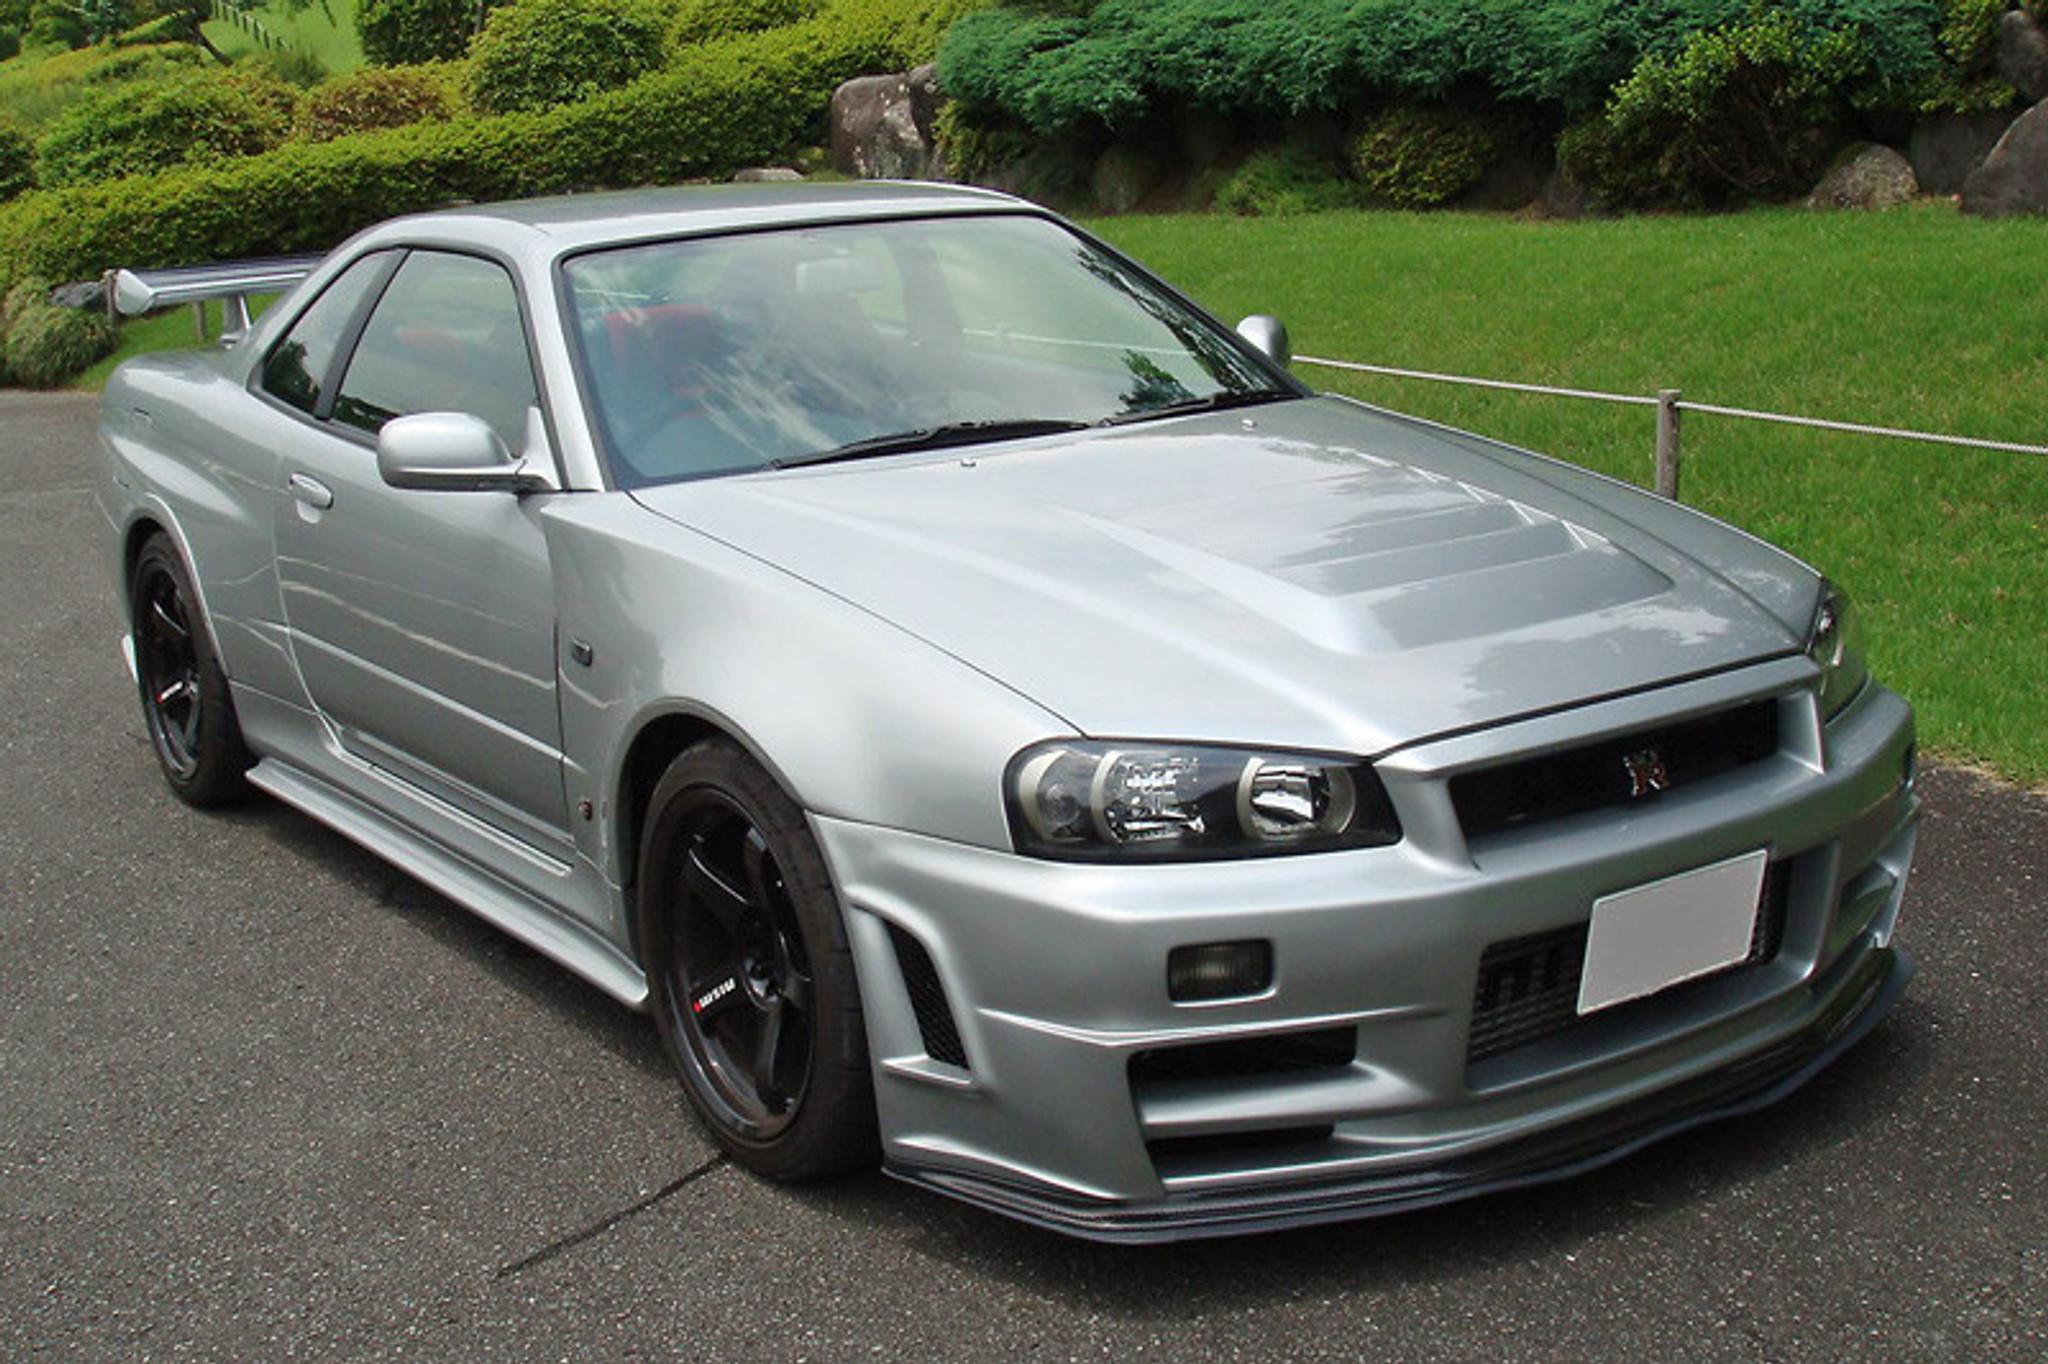 Nissan Skyline R34 Gtr Z Tune Style Front Bumper Meduza